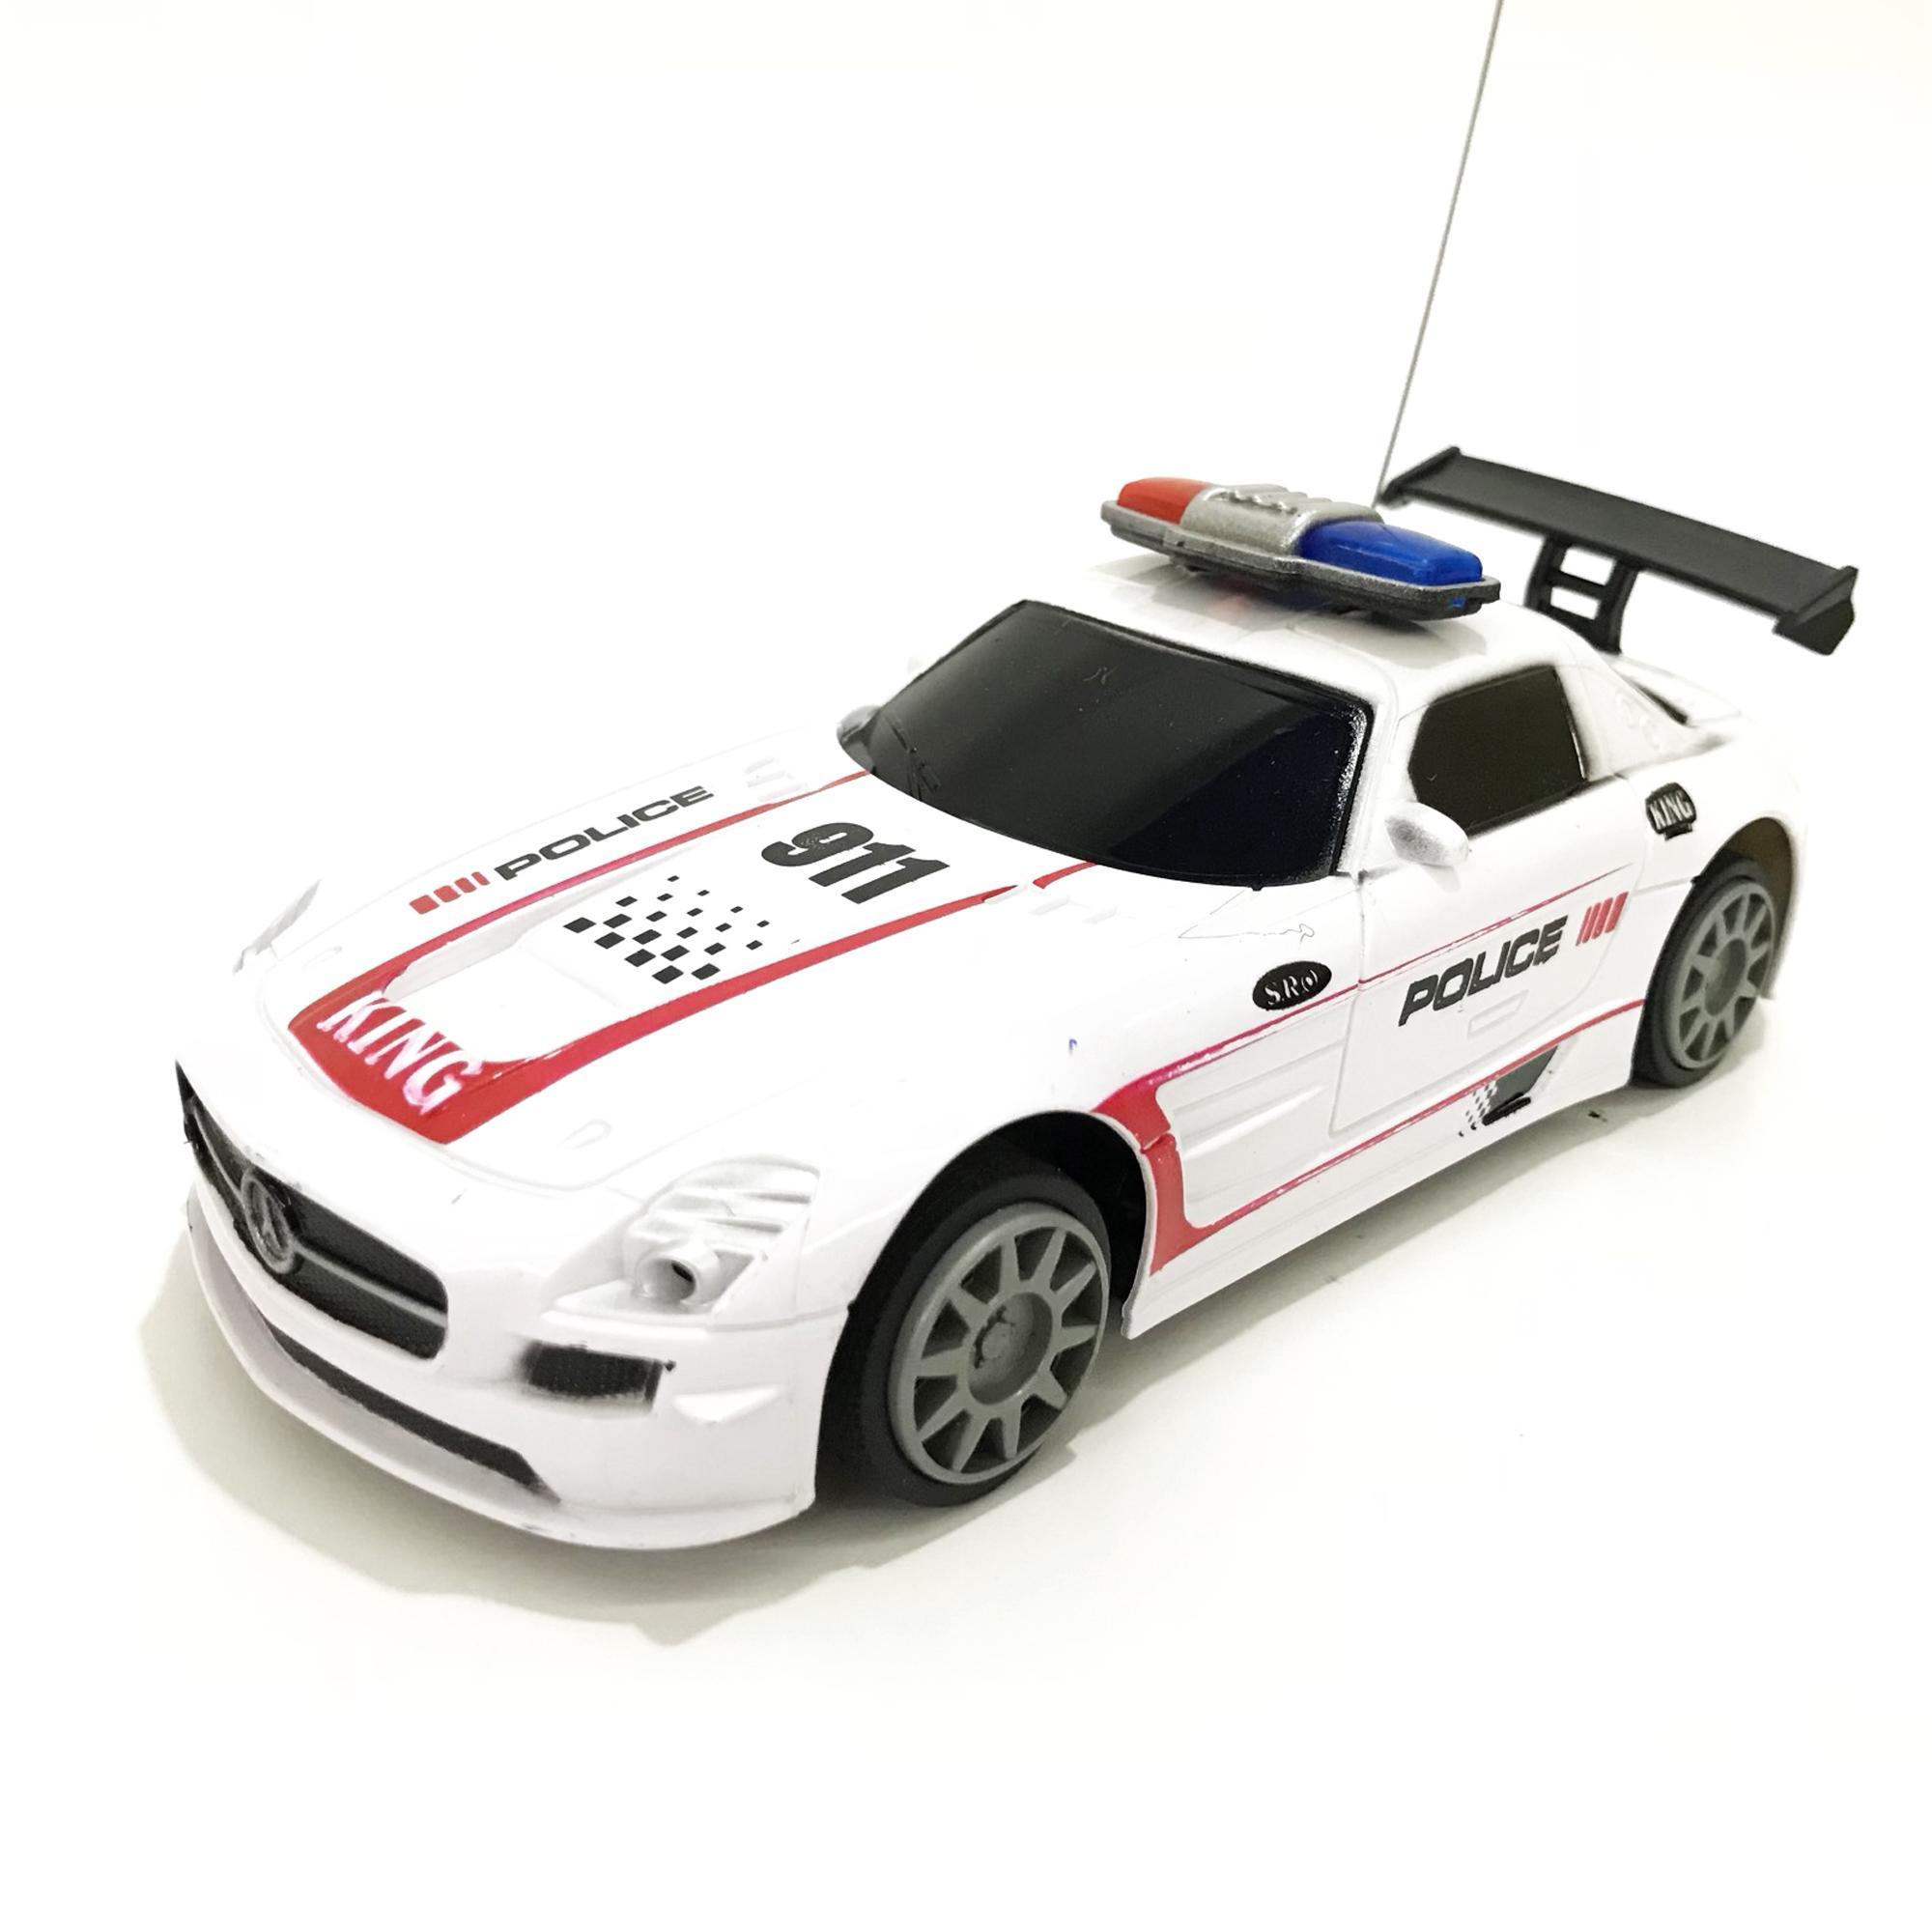 (FREE PACKING KERTAS KADO) RKJ Mainan Anak RC Mobil Remot Racing King Car  Police c9b0d0d133